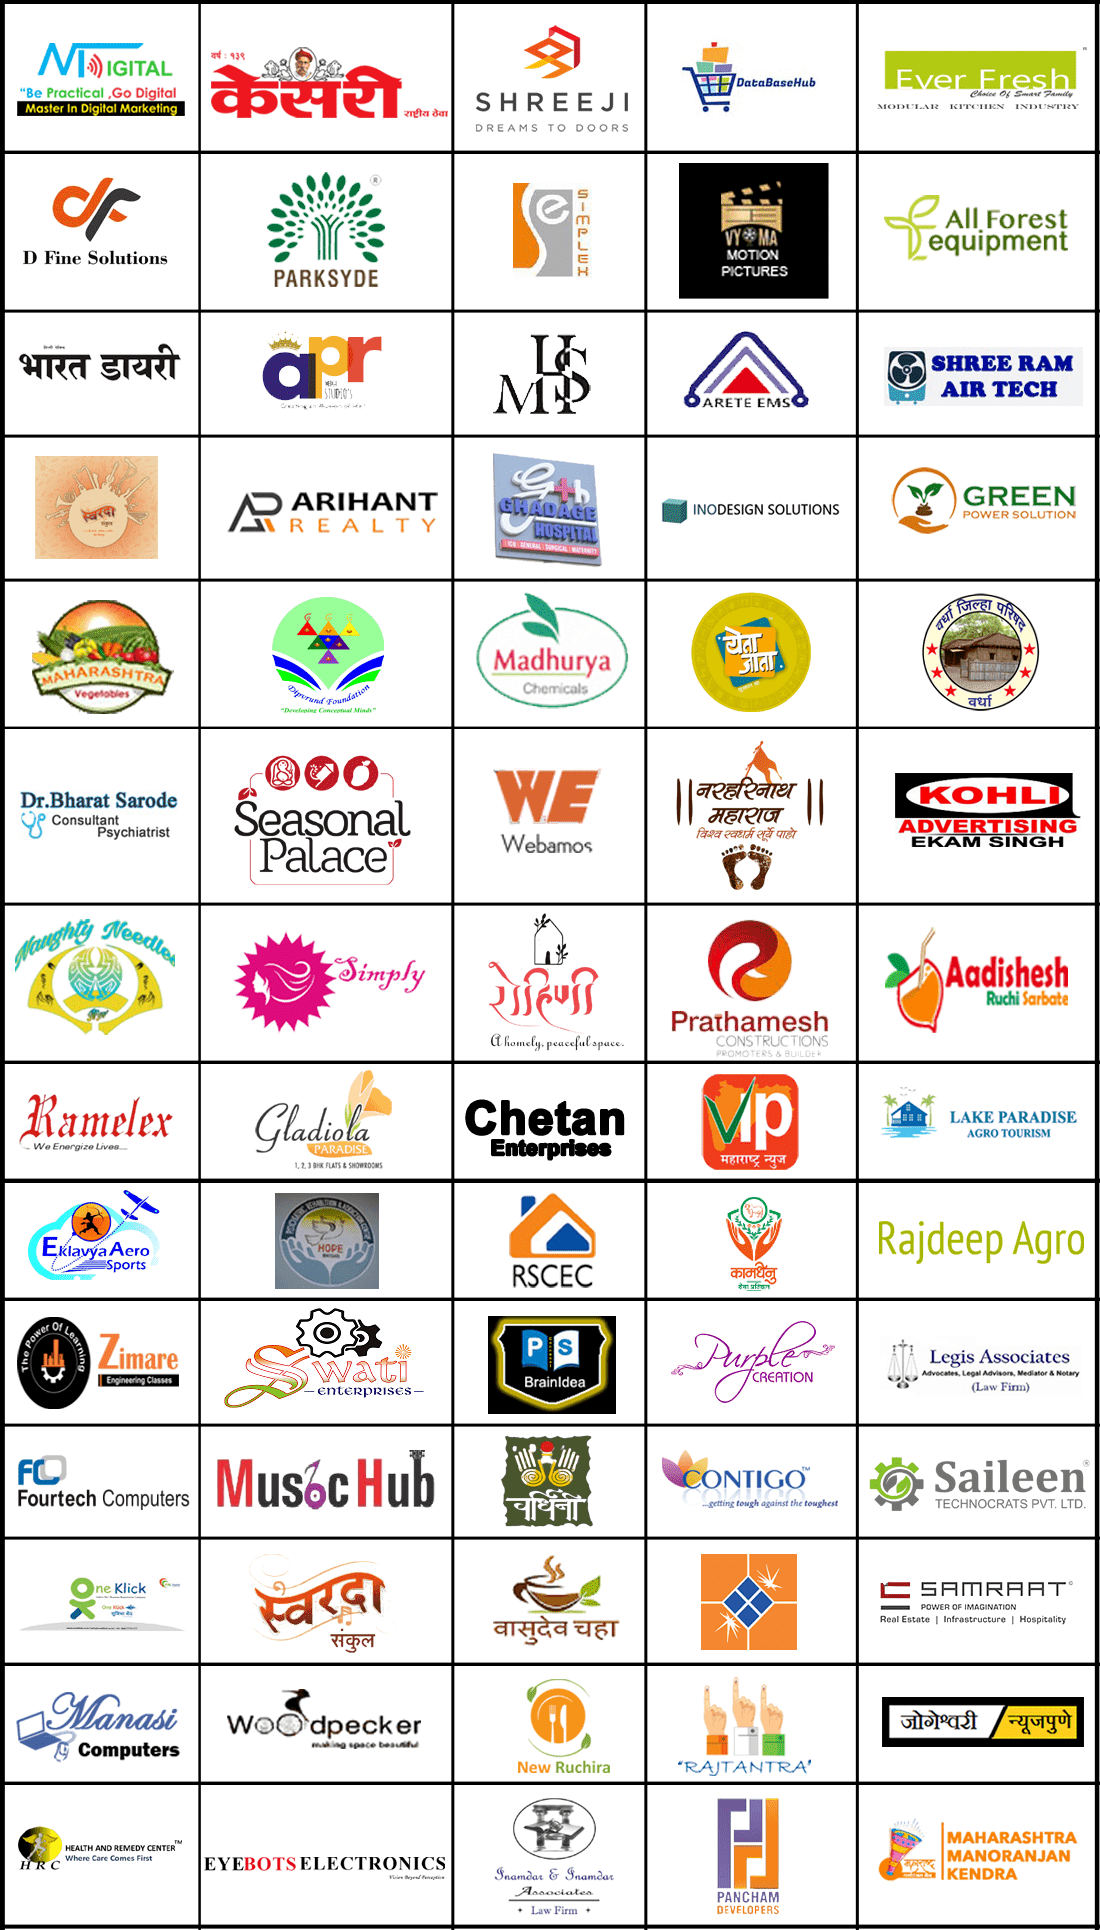 Gigante Technologies Partners